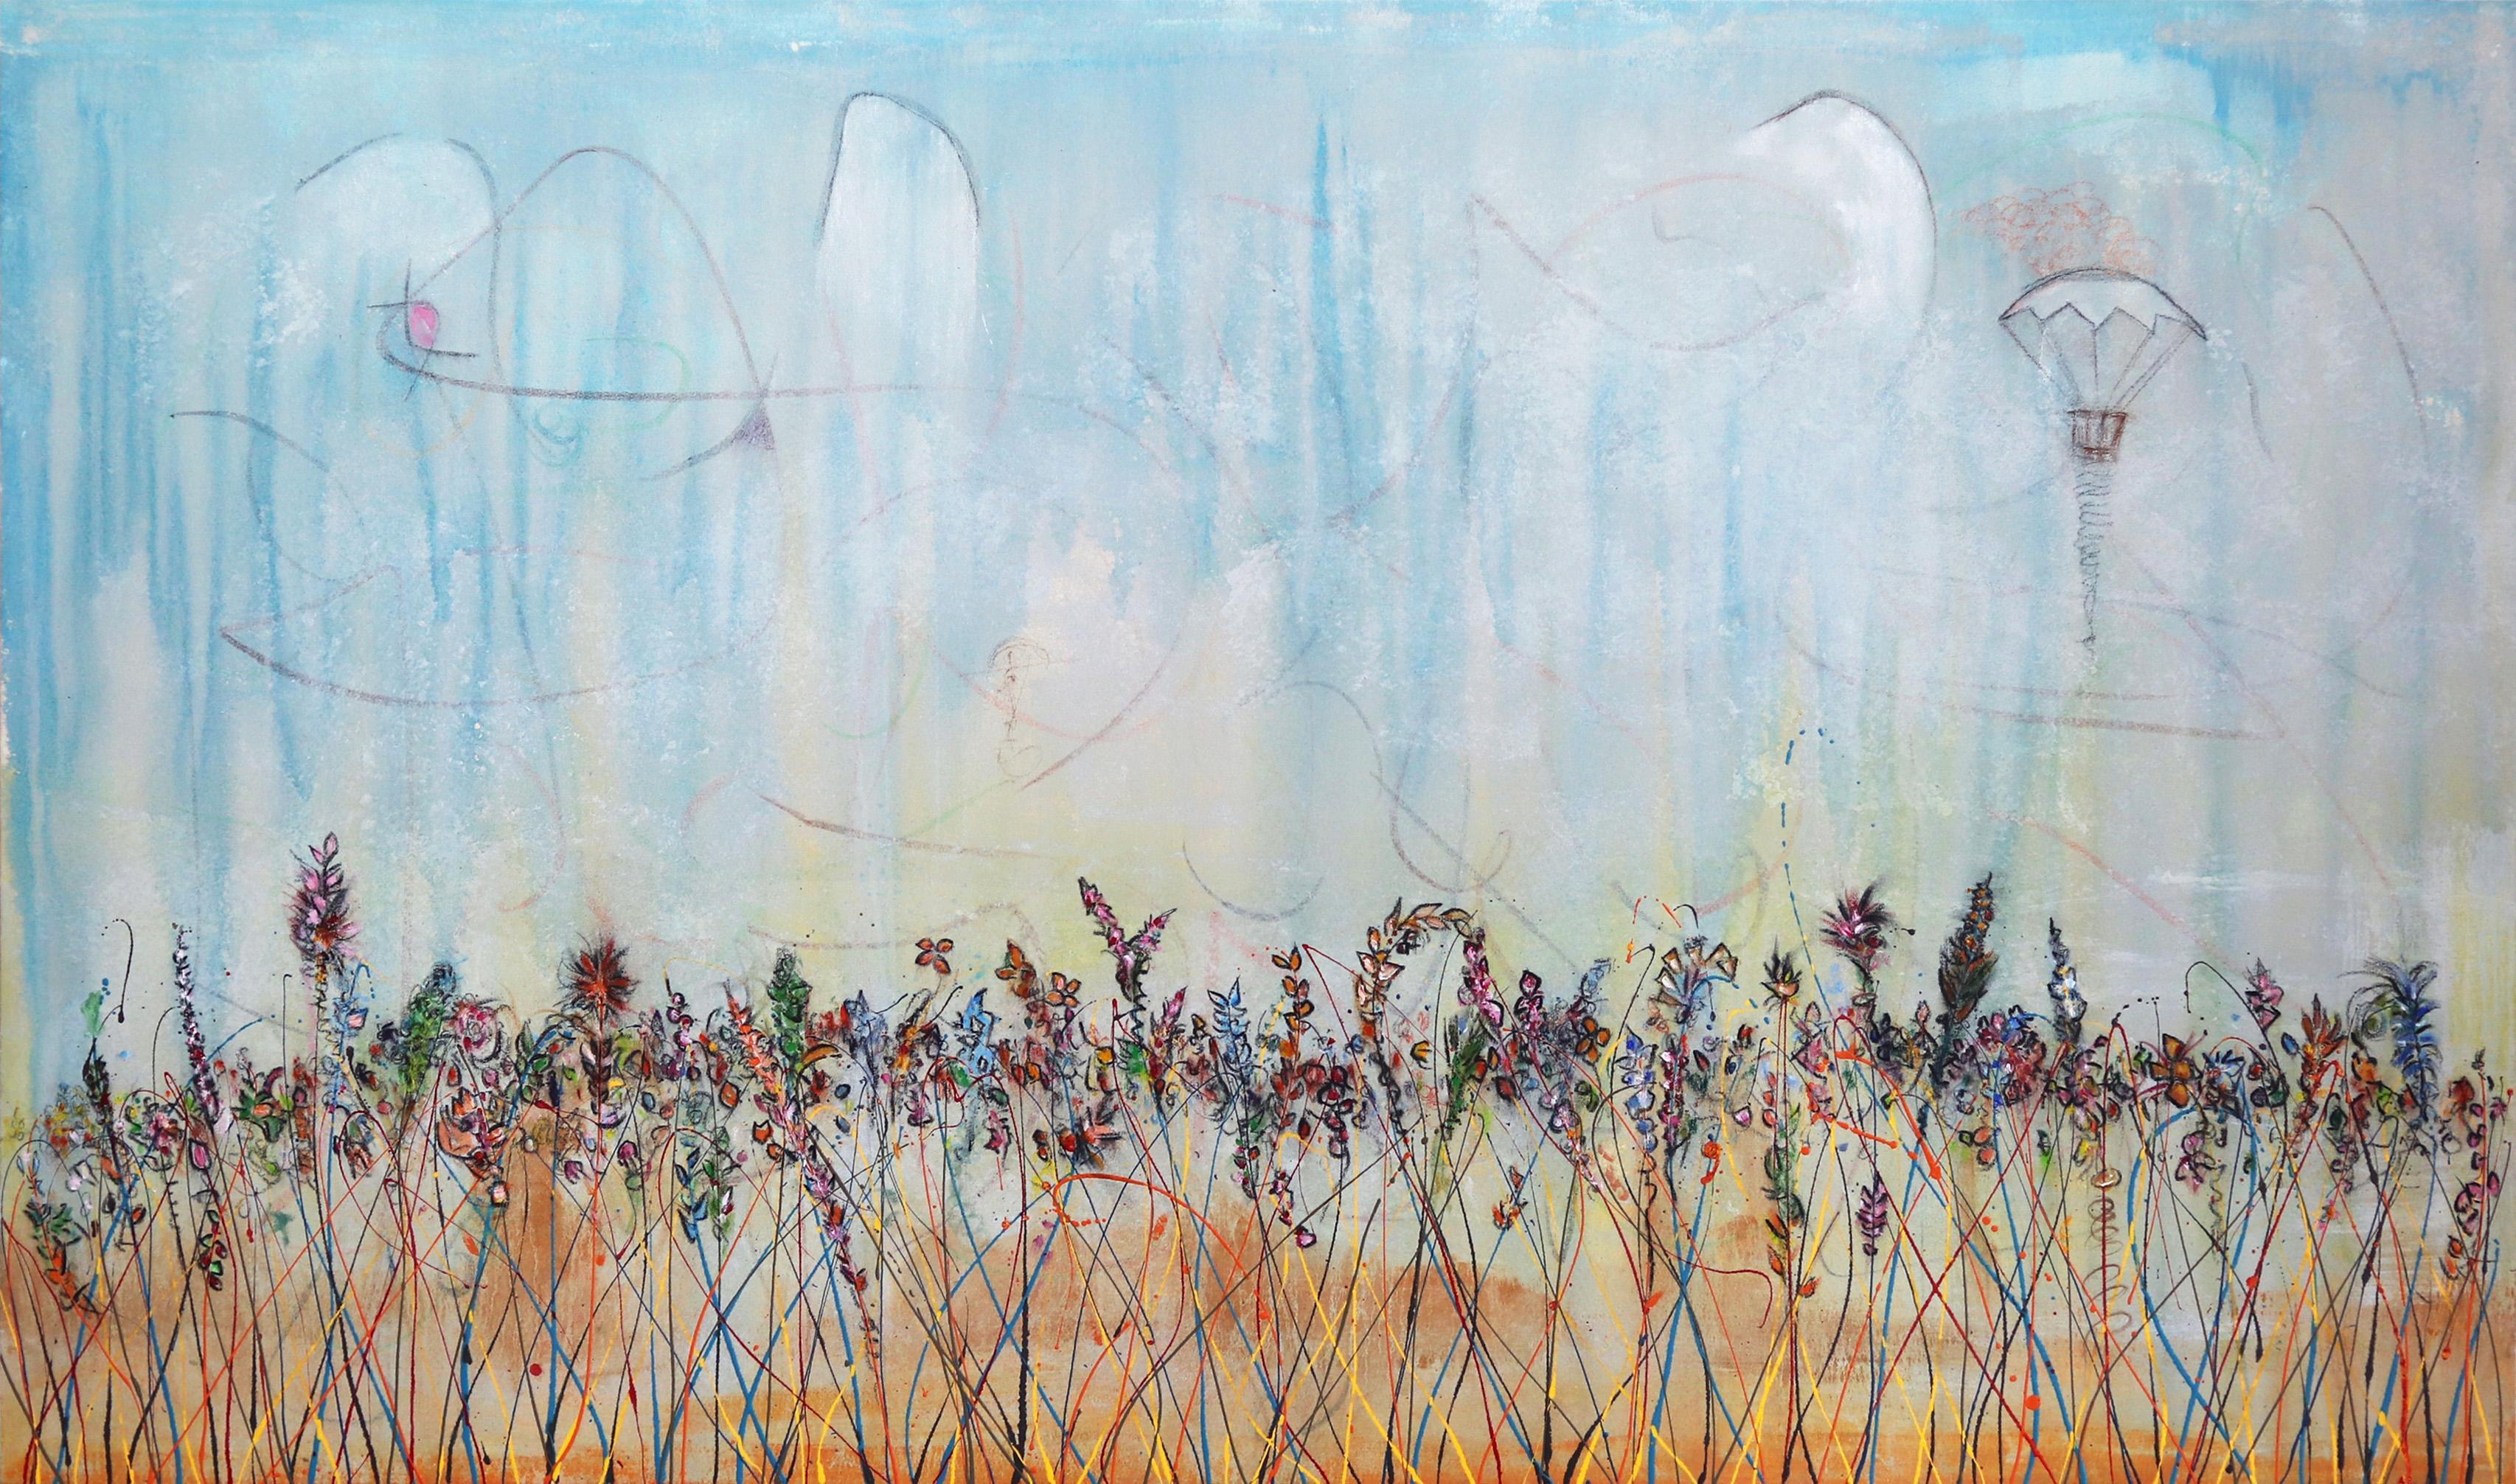 Landscape 2020 - large scale original artwork